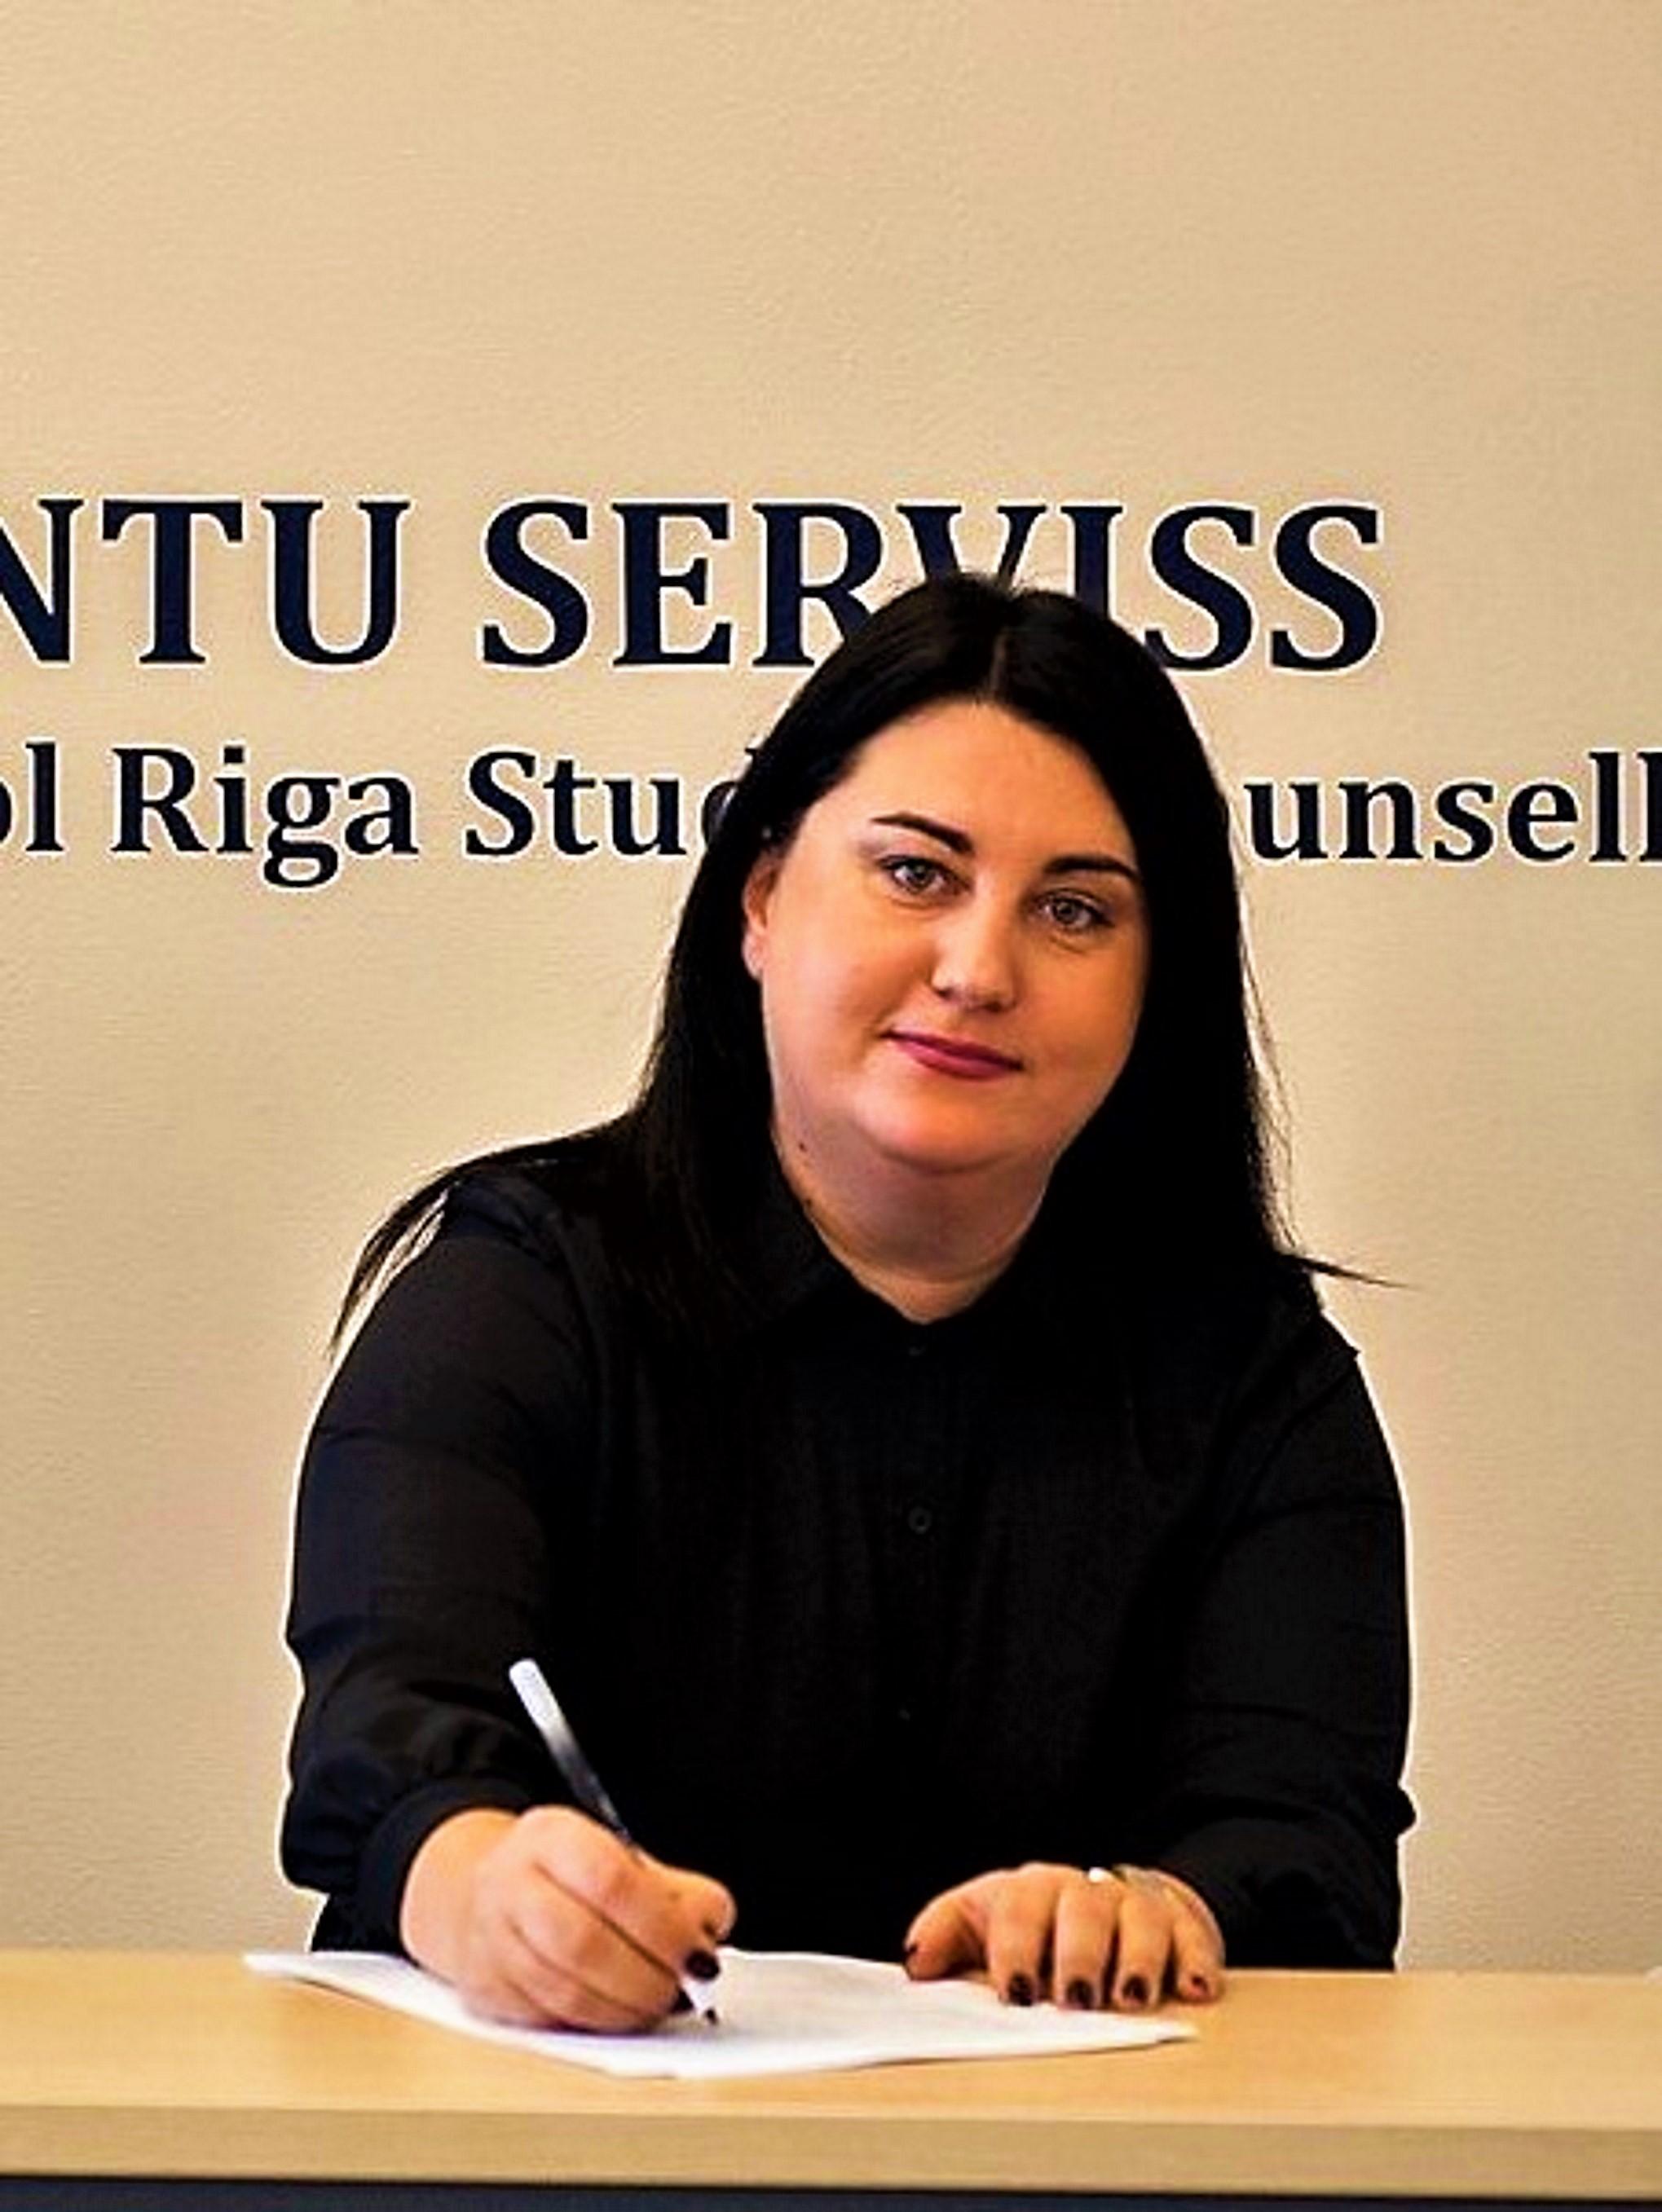 Anita Brutāne, Head of Student Service